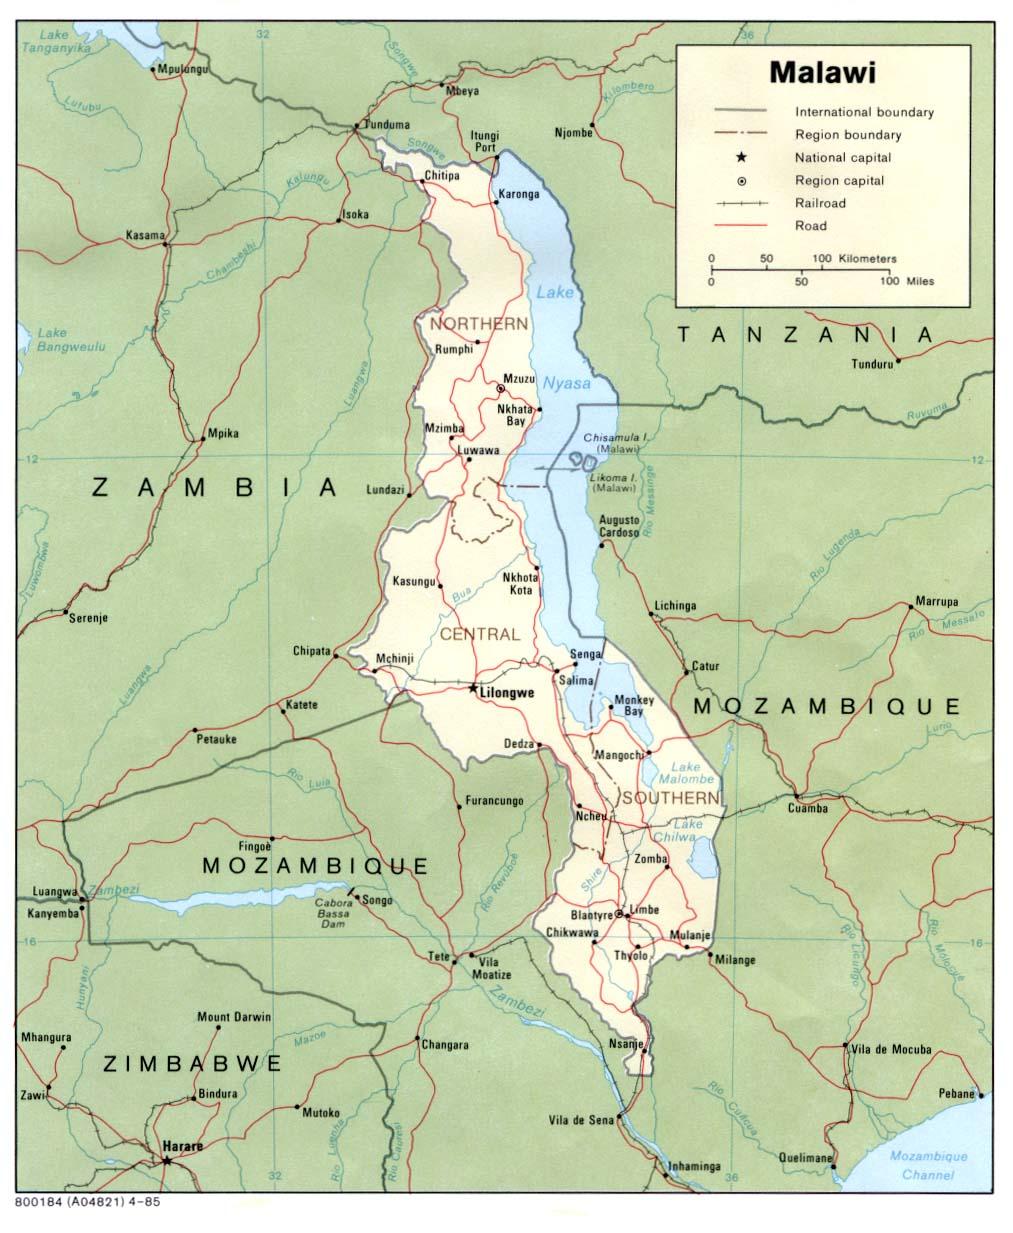 Free online dating malawi